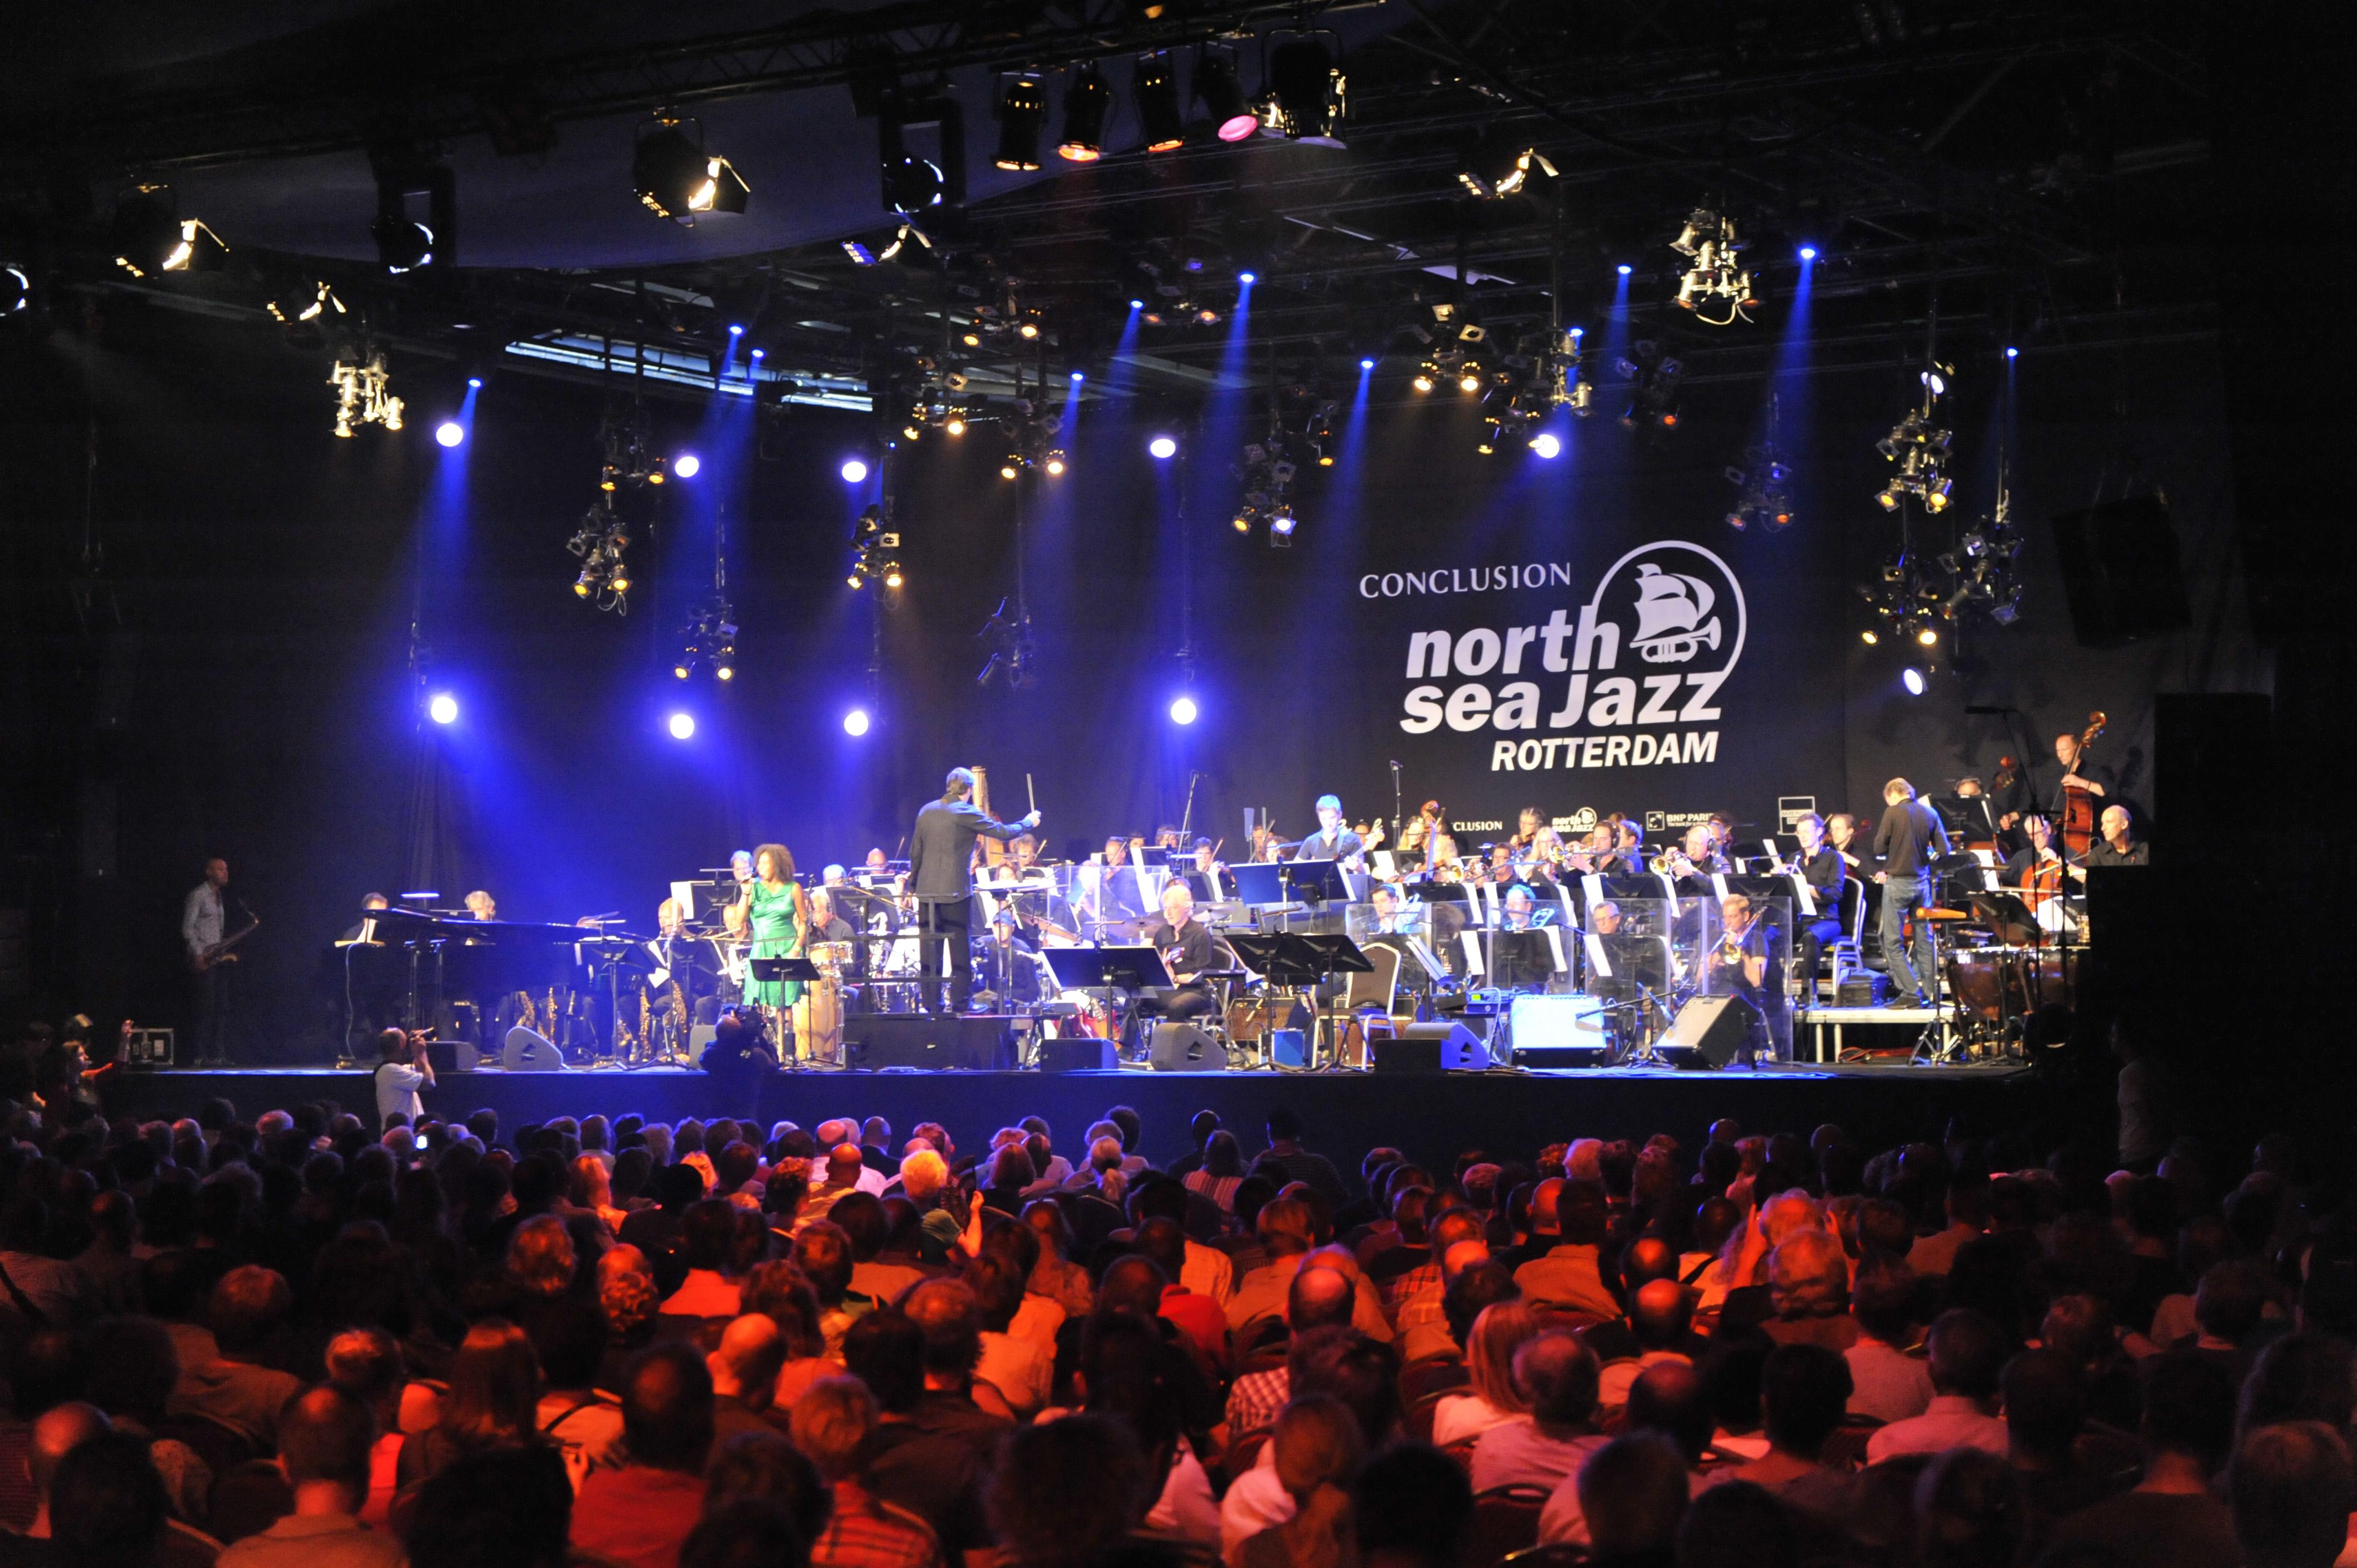 North Sea Jazz festival 2013 (part II)